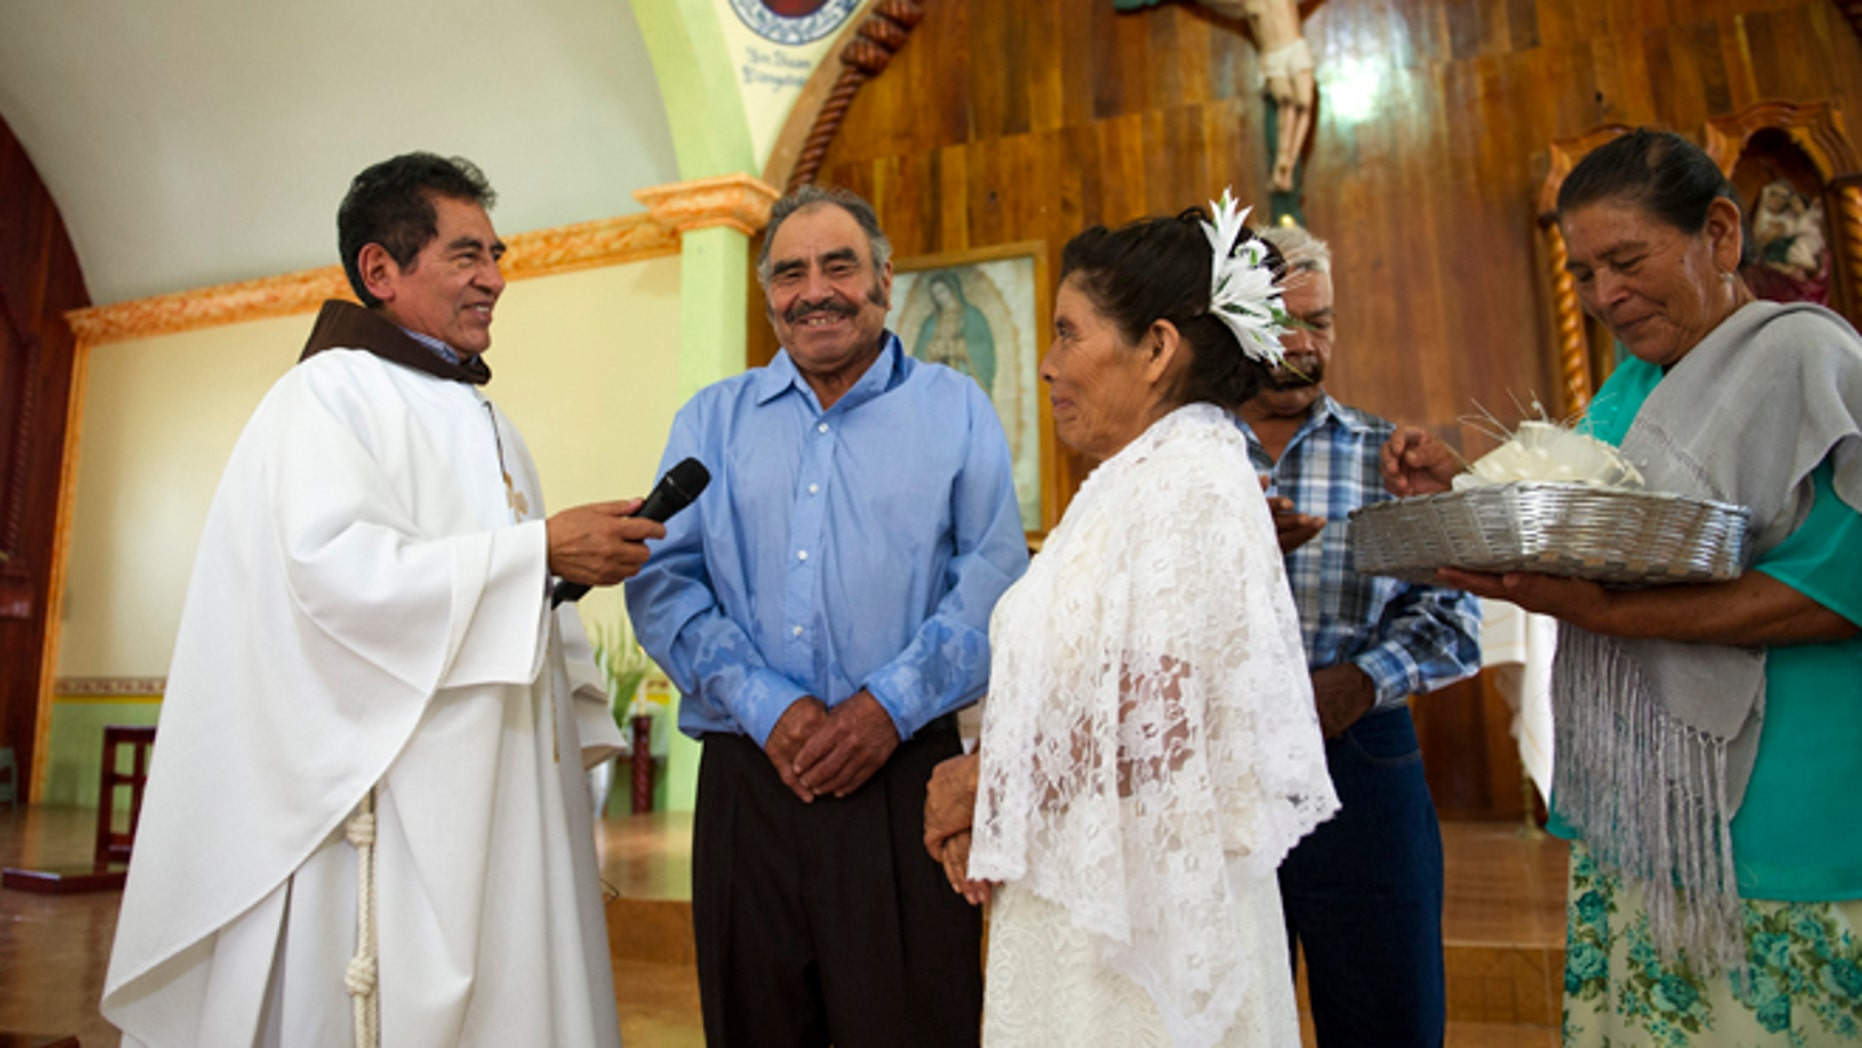 Francisca Santiago, 65, and Pablo Ibarra, 75, exchange wedding vows on July 23, 2016.